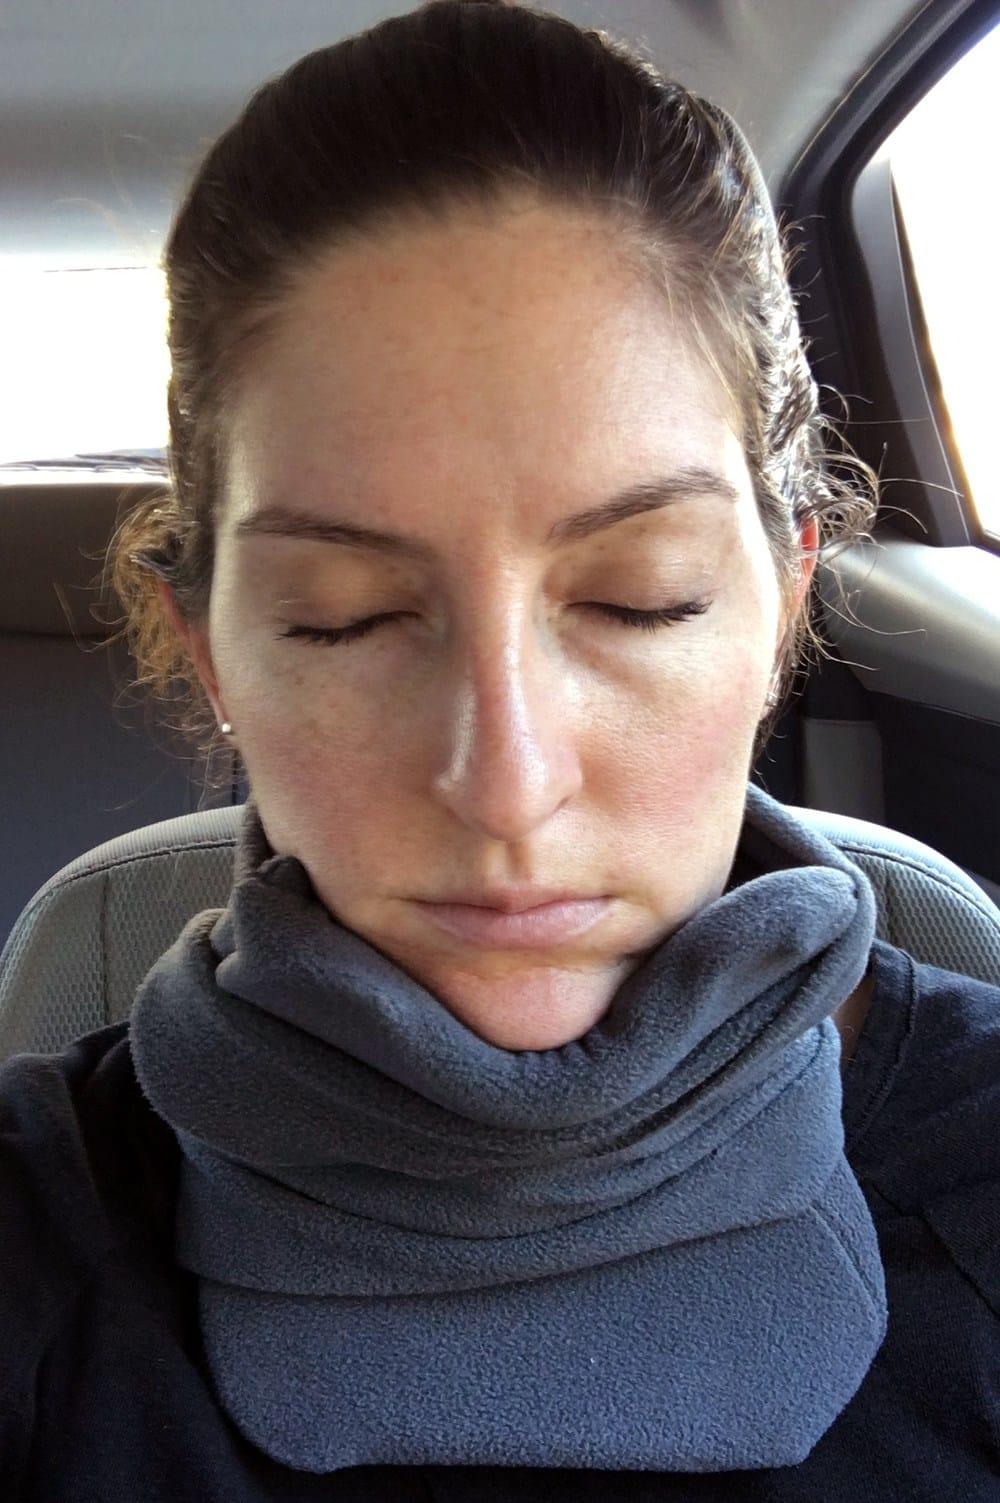 Trtl Travel Pillow Review